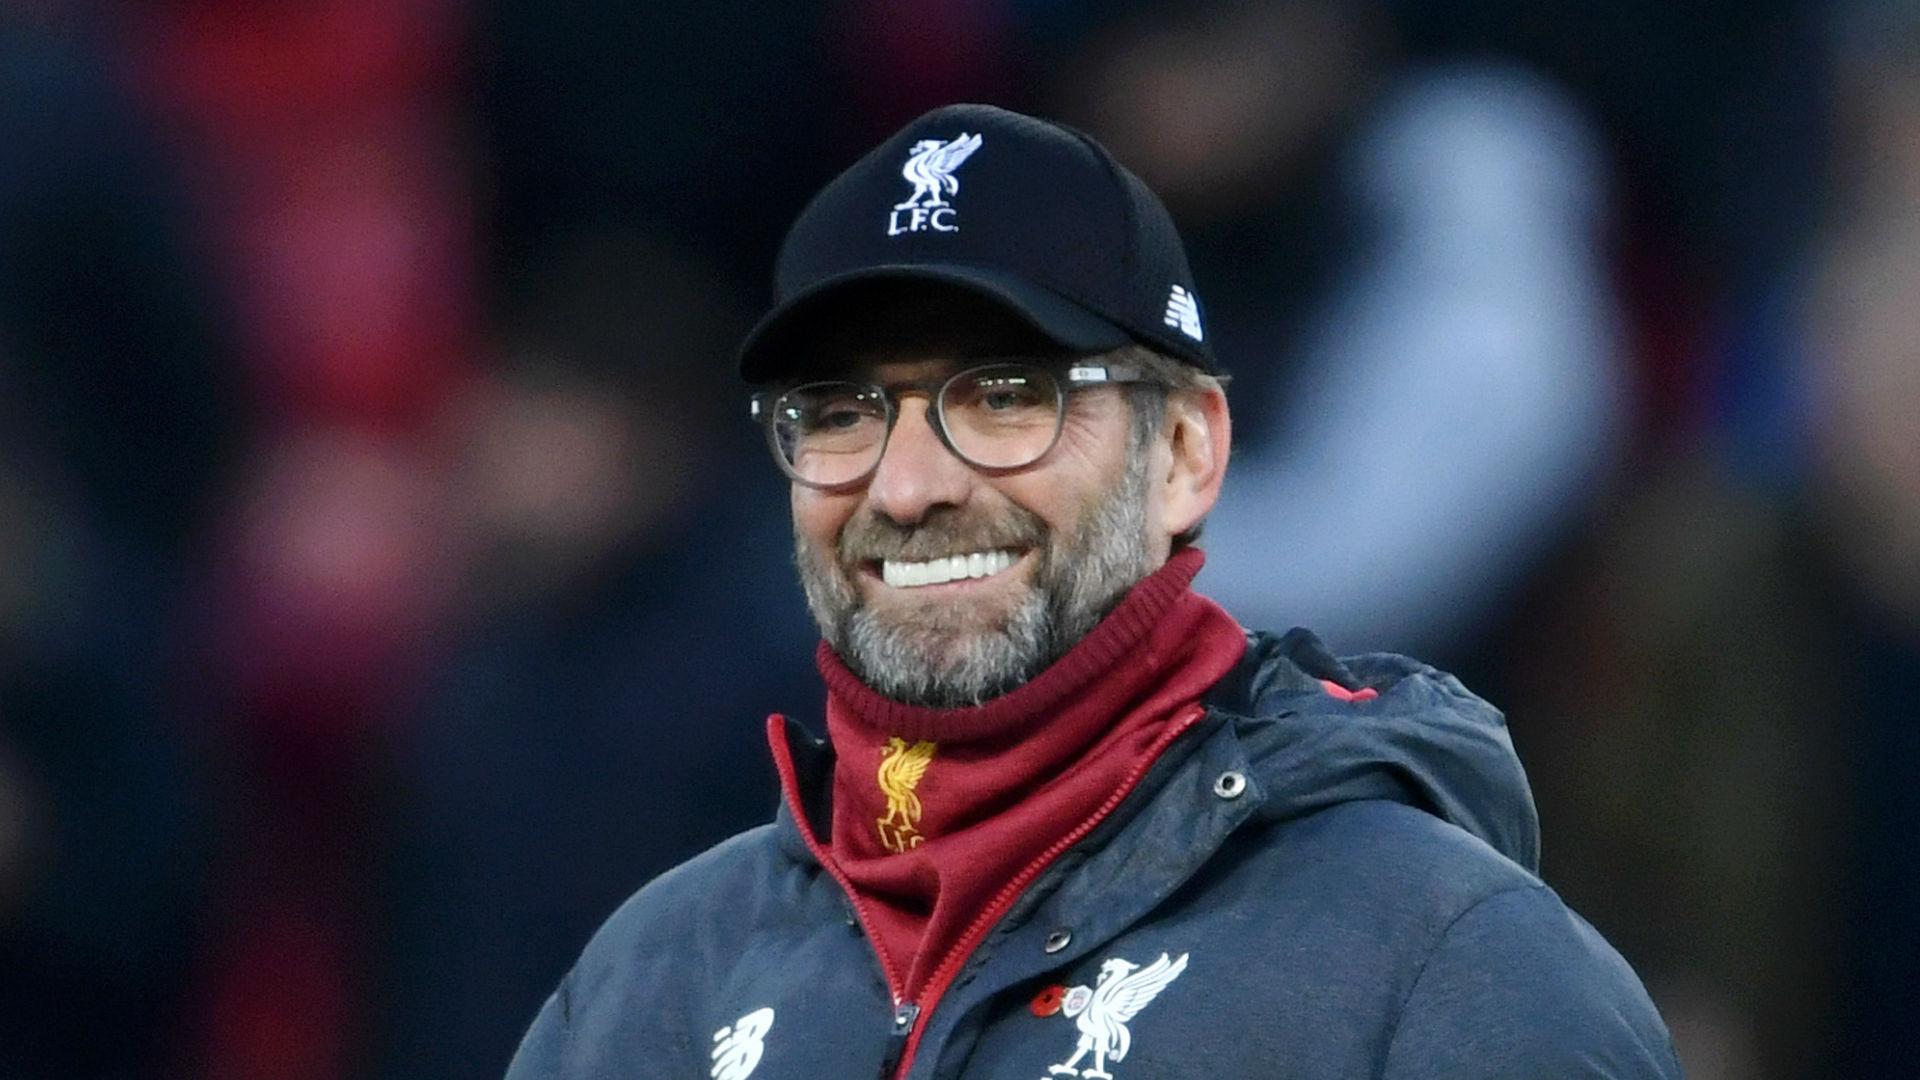 Liverpool manager Jurgen Klopp meets Siya Kolisi and Faf du Plessis